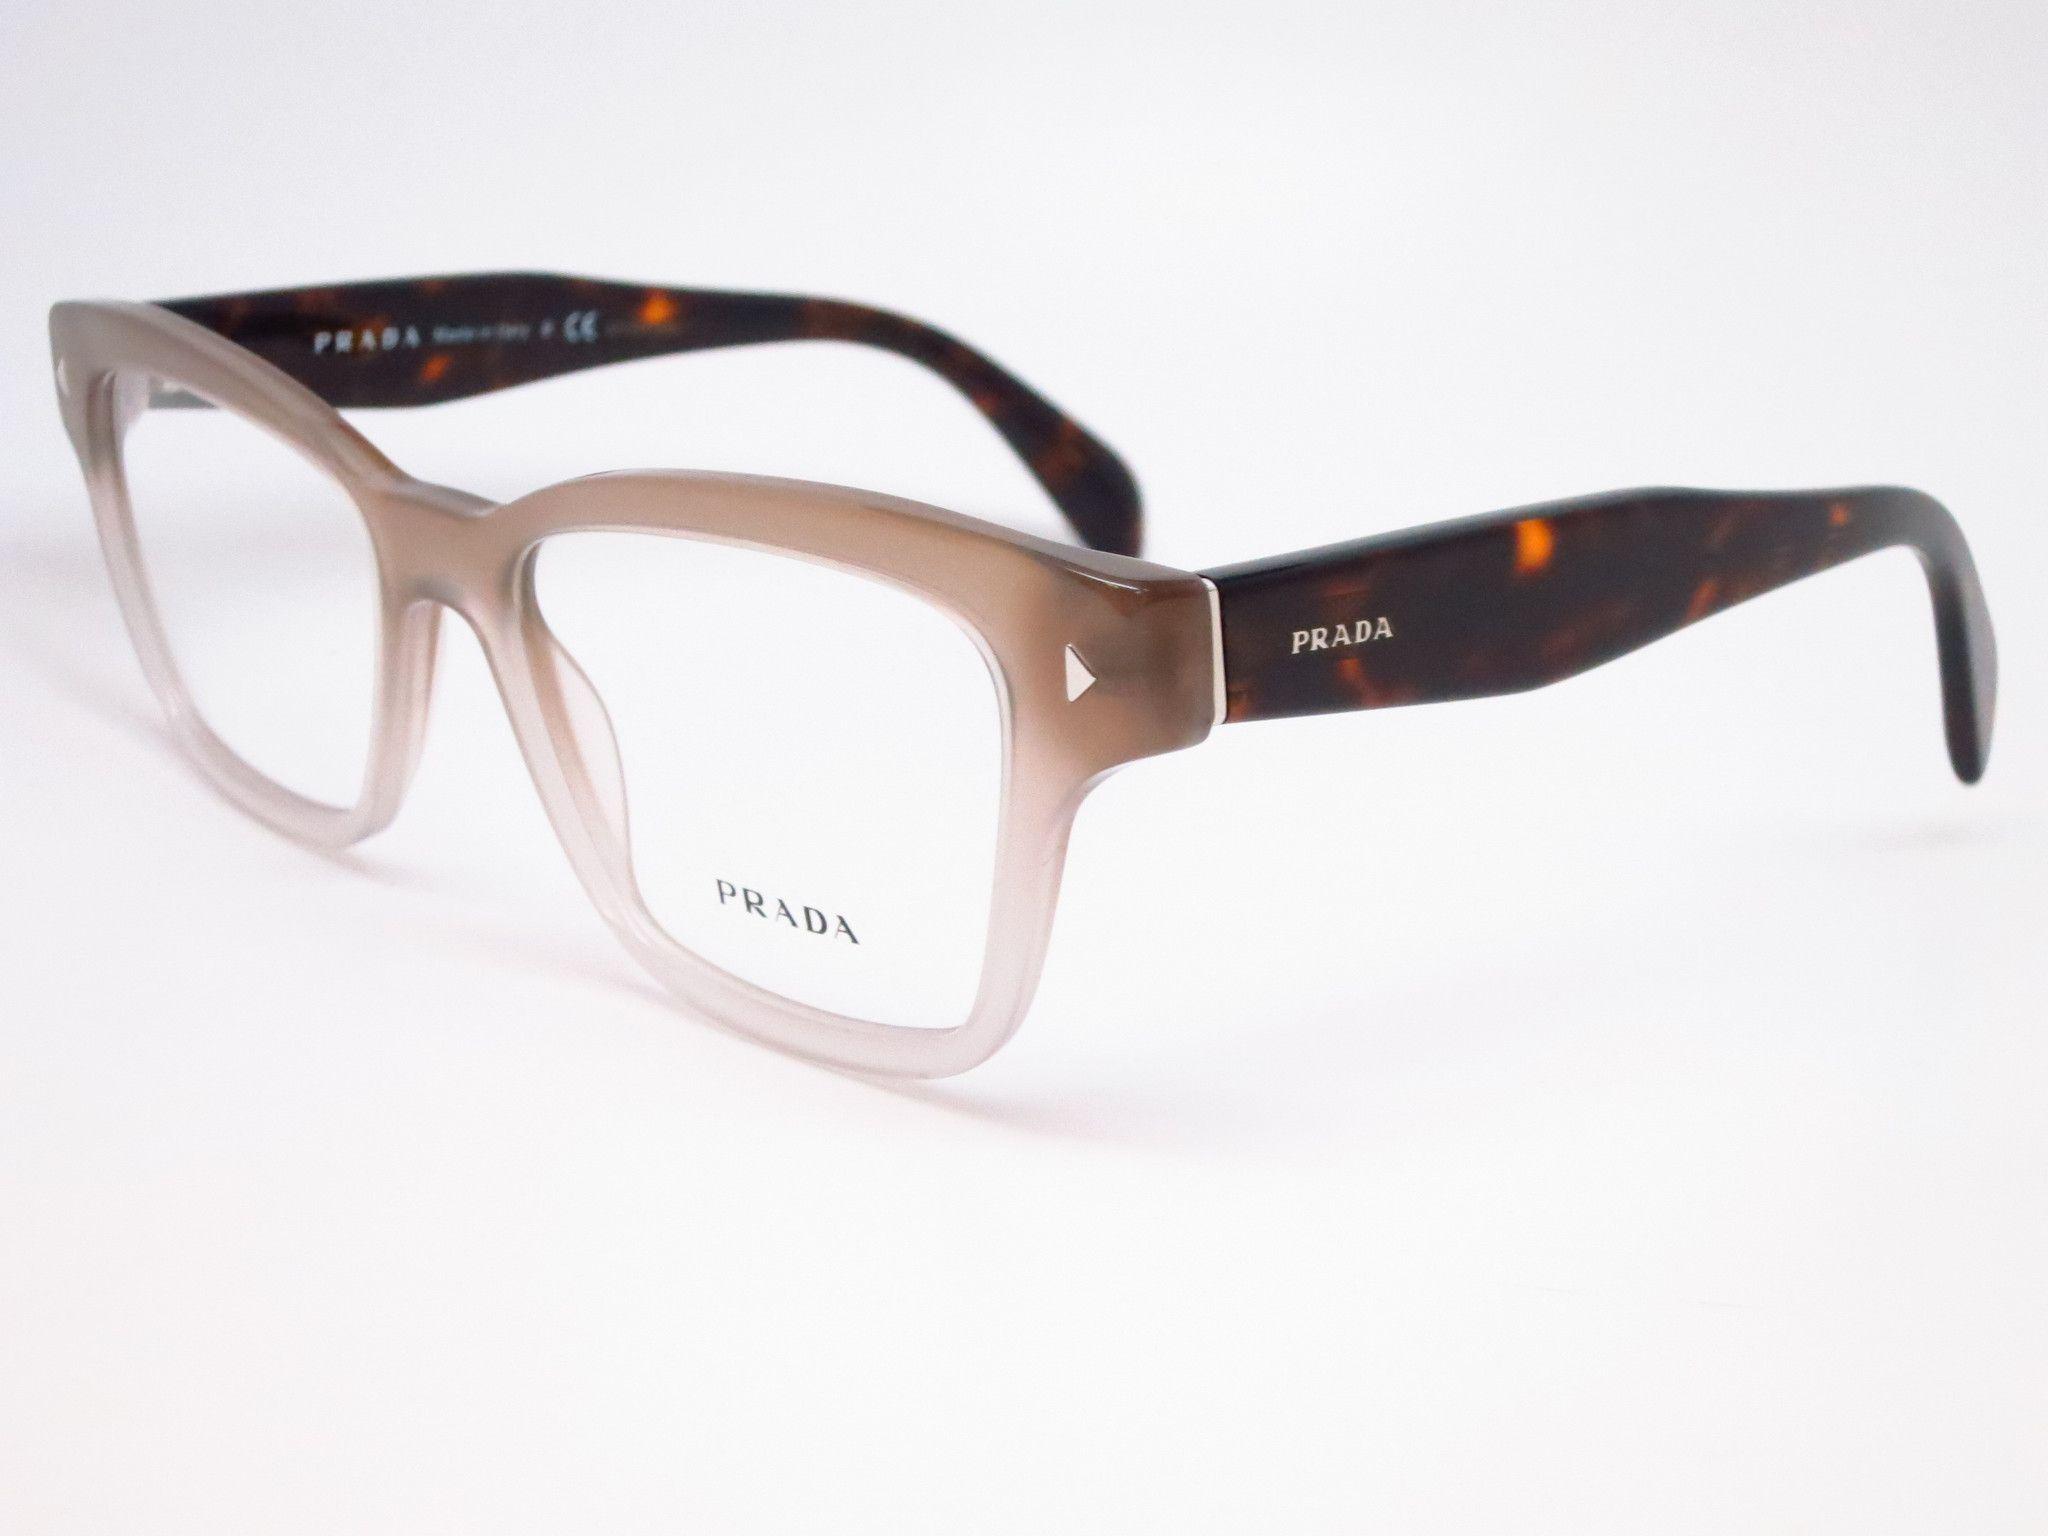 9bfbb3e67b7b Prada VPR 10S UBJ-1O1 Grey Gradient Eyeglasses | A girl must have ...